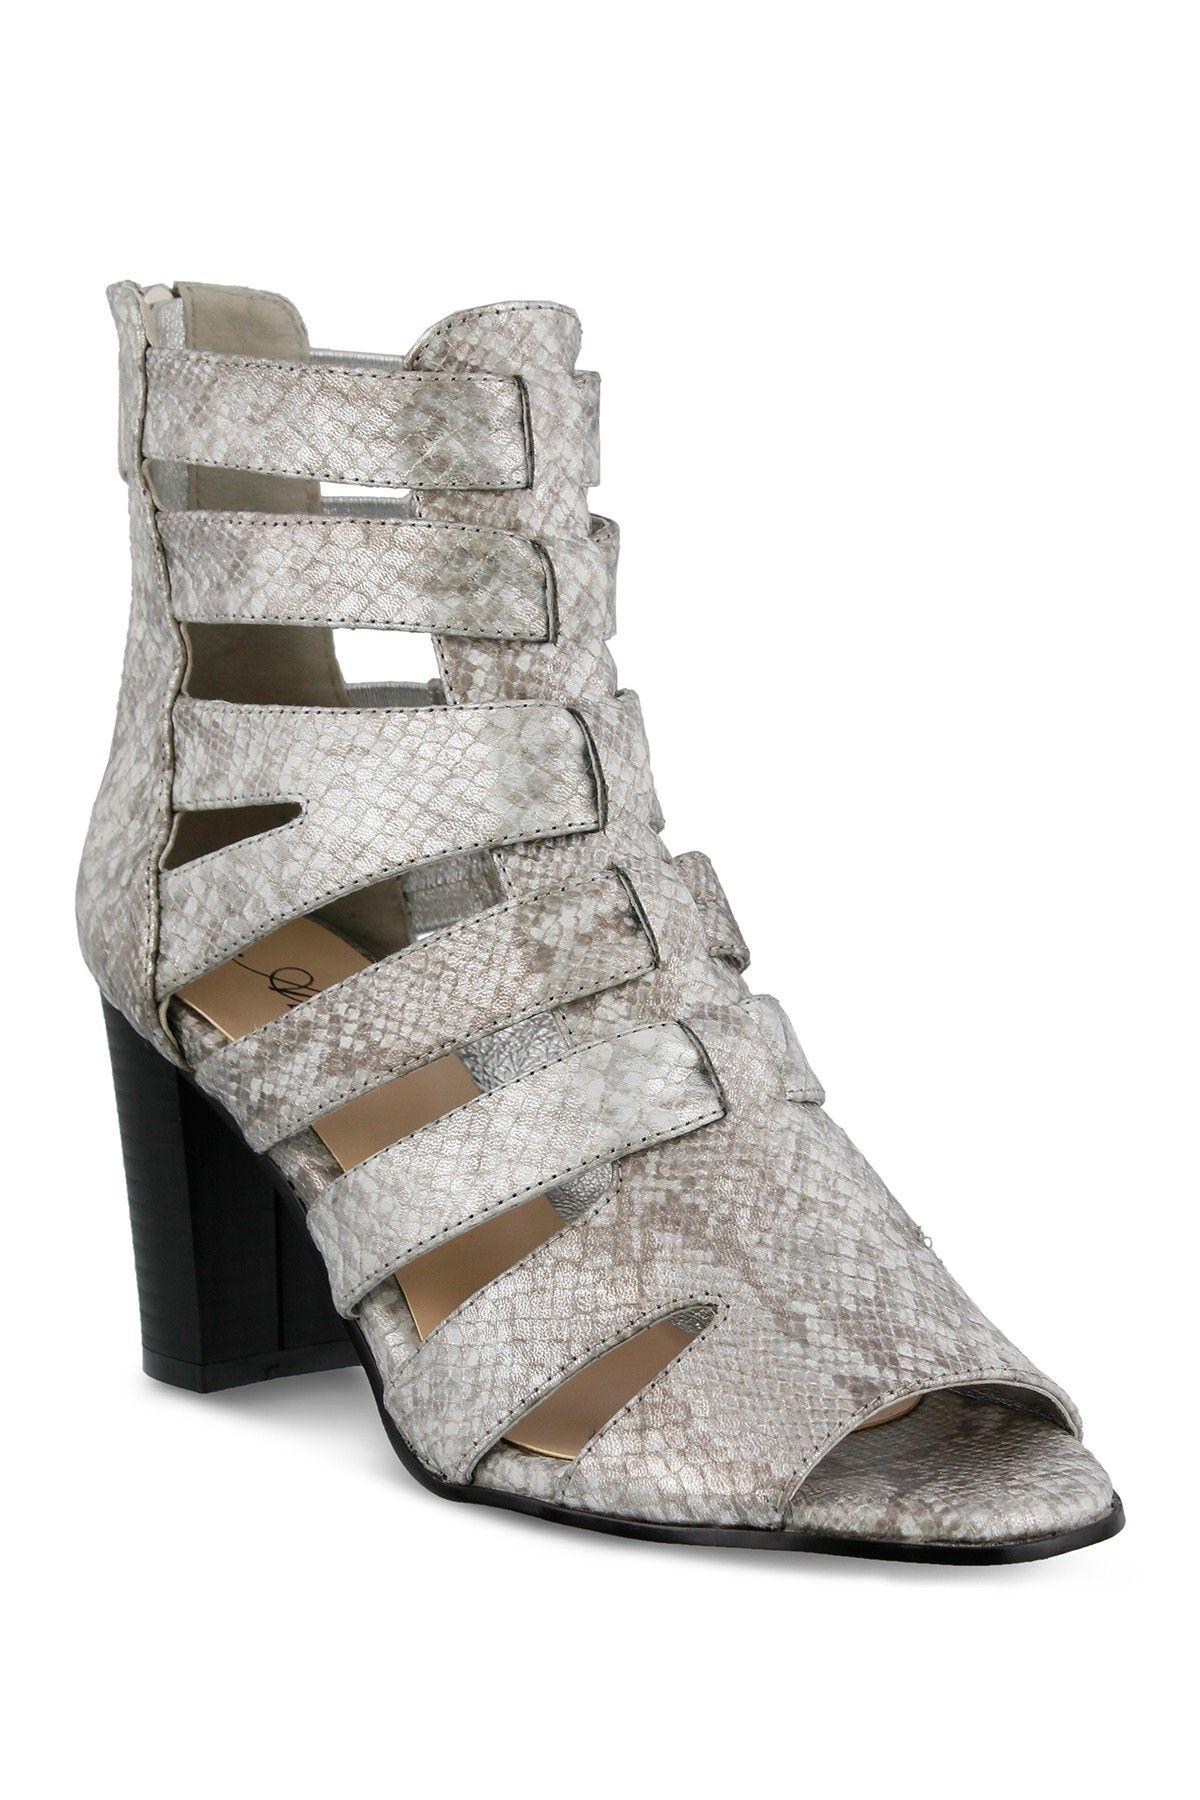 2fee665ff448 AZURA Quidam Python Printed Gladiator Heel Sandal